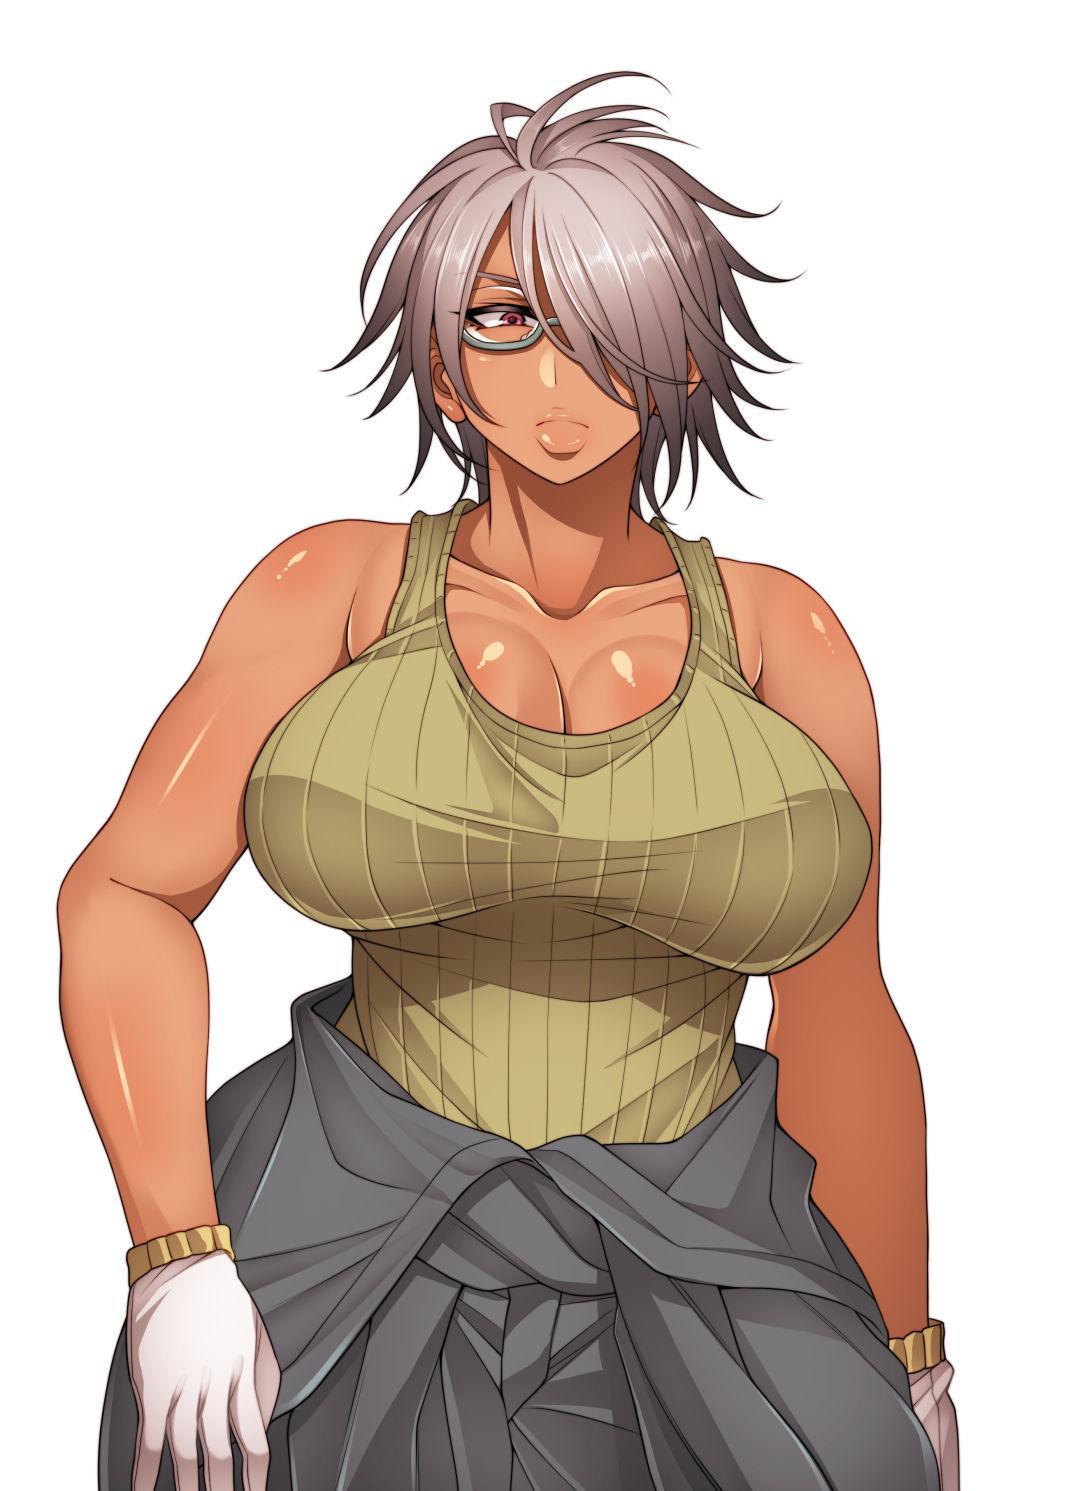 Nekura Megane ♀   The Creepy Glasses Girl 227